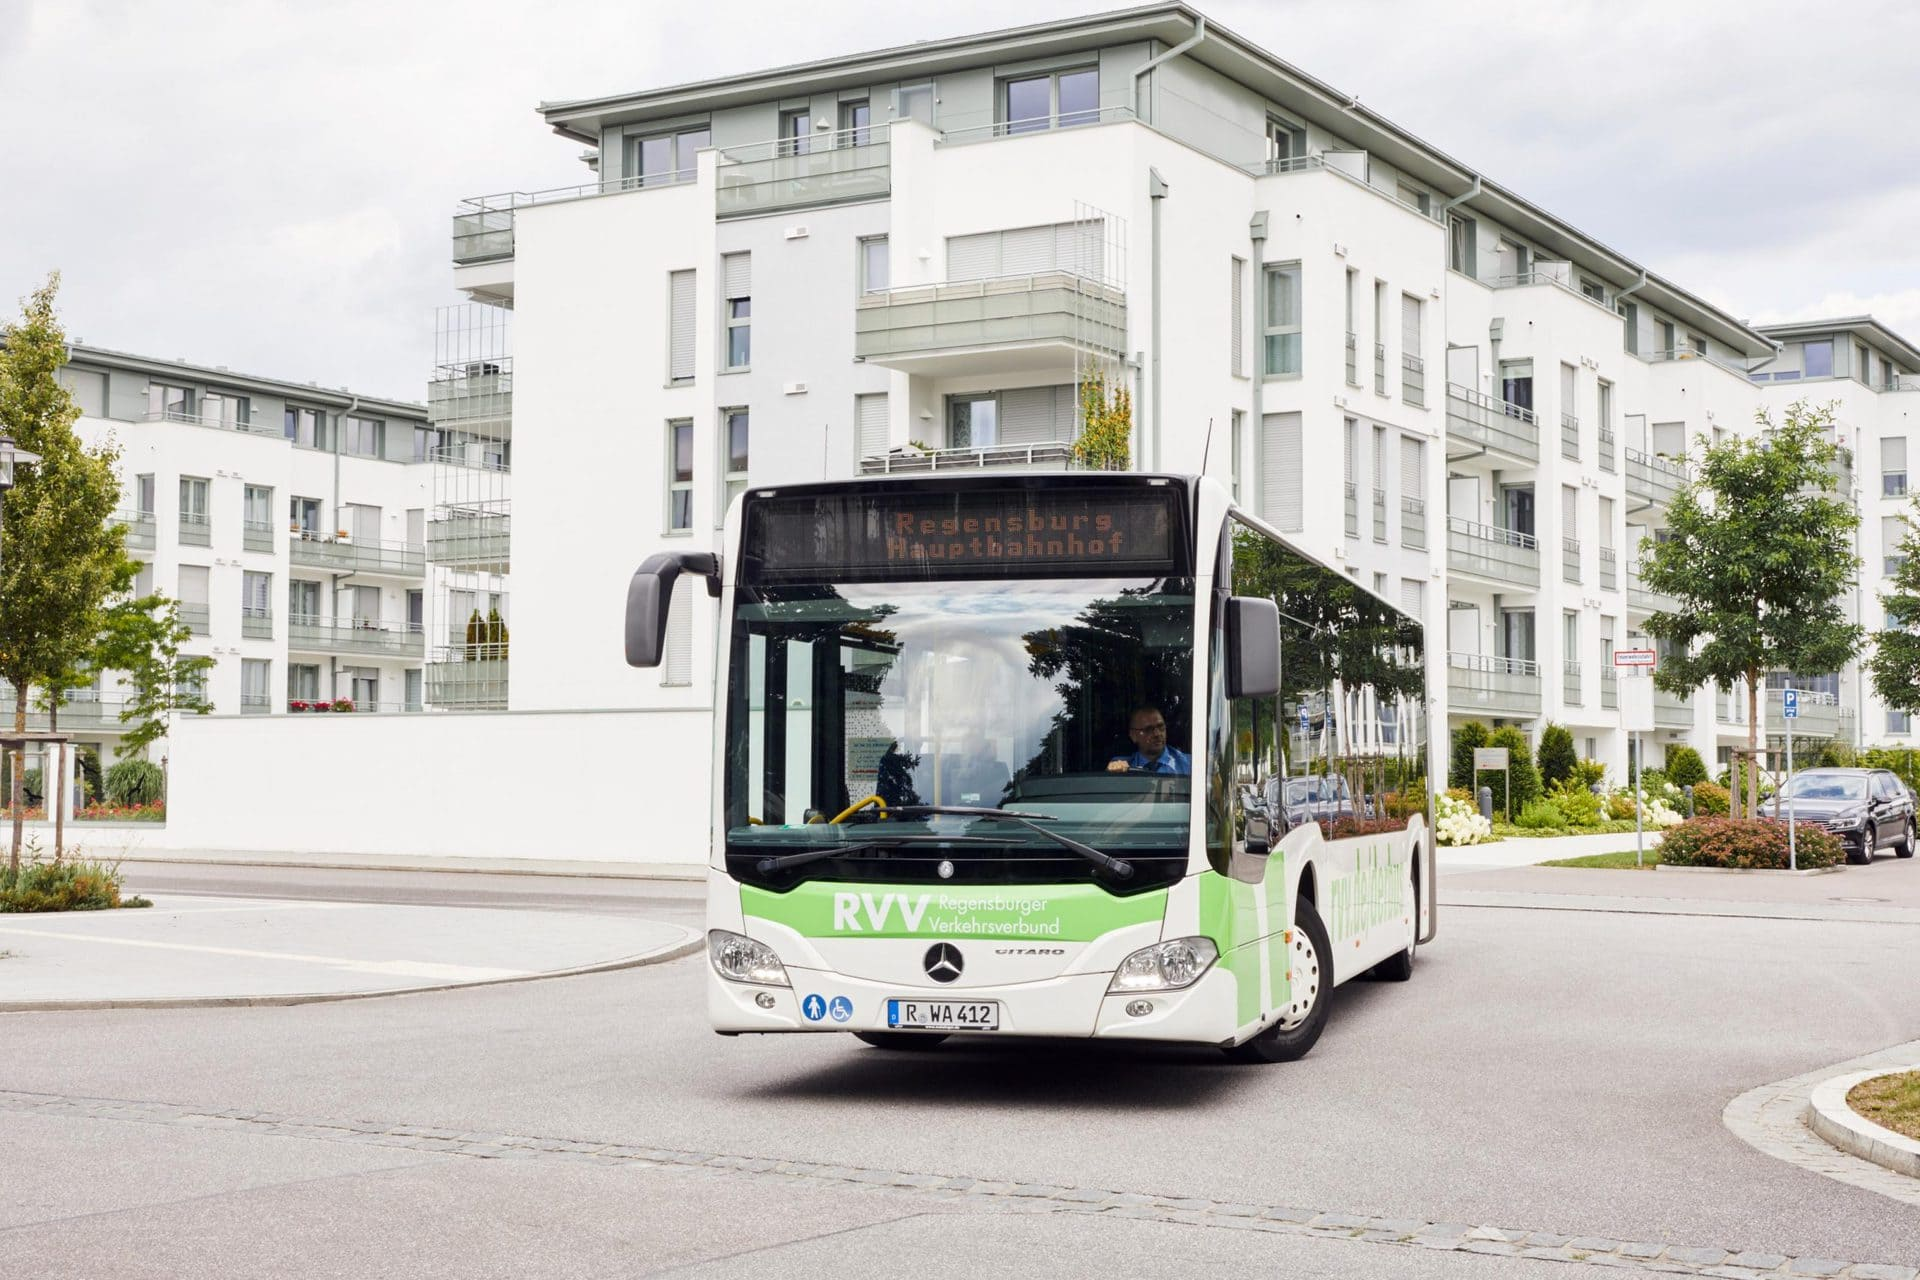 Busfahrplan Rvv